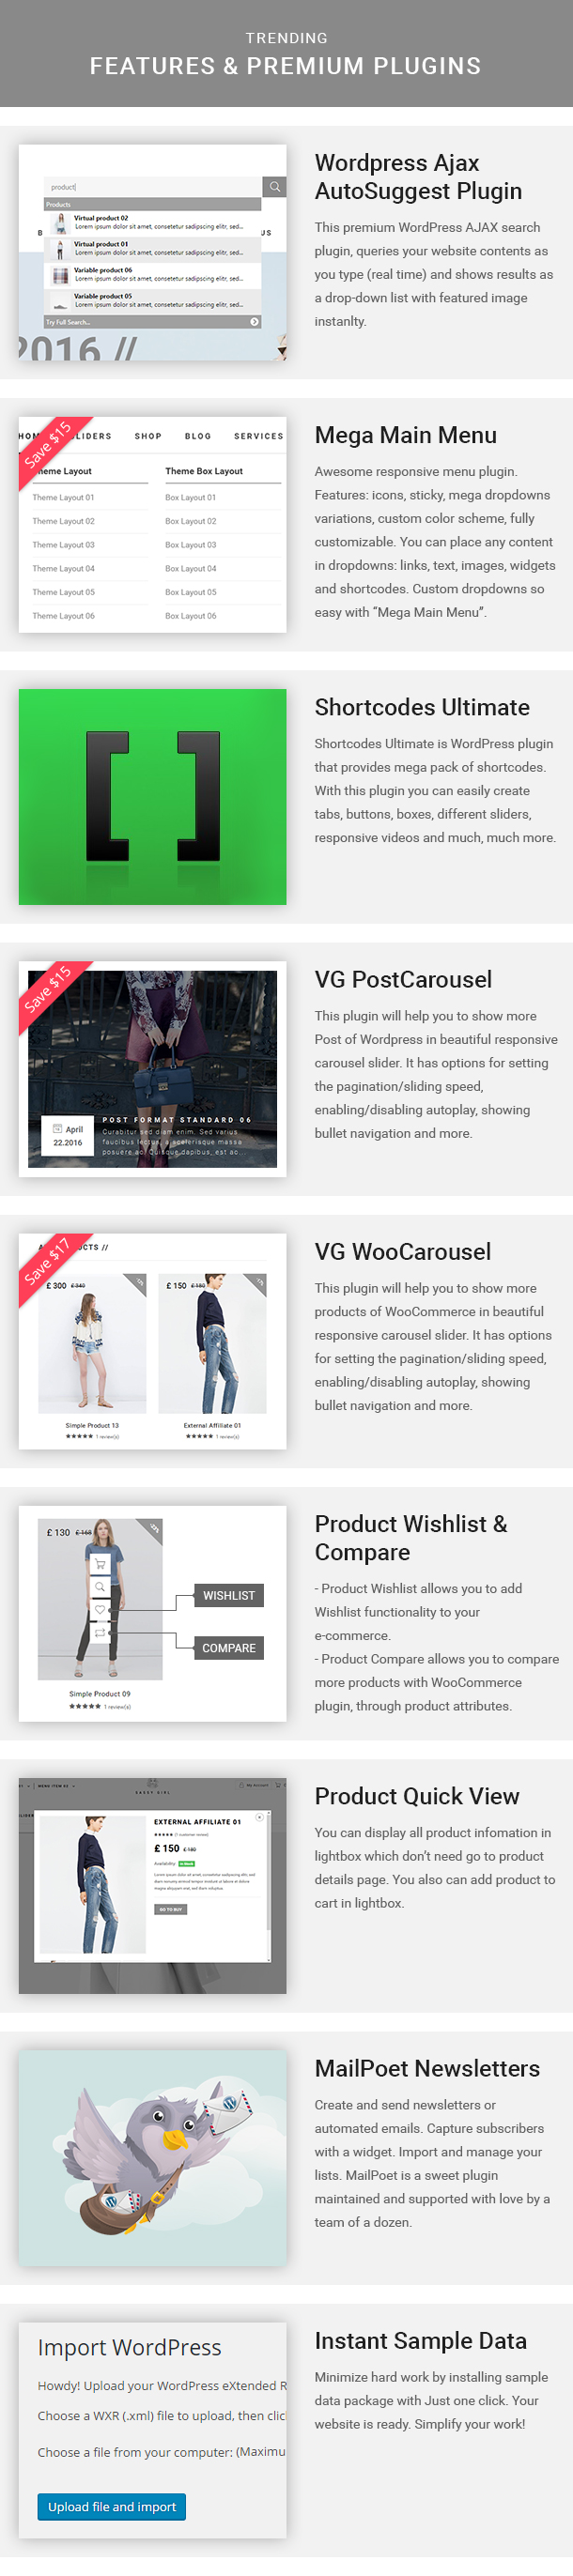 VG Sassy Girl - Responsive WooCommerce WordPress Theme - 27